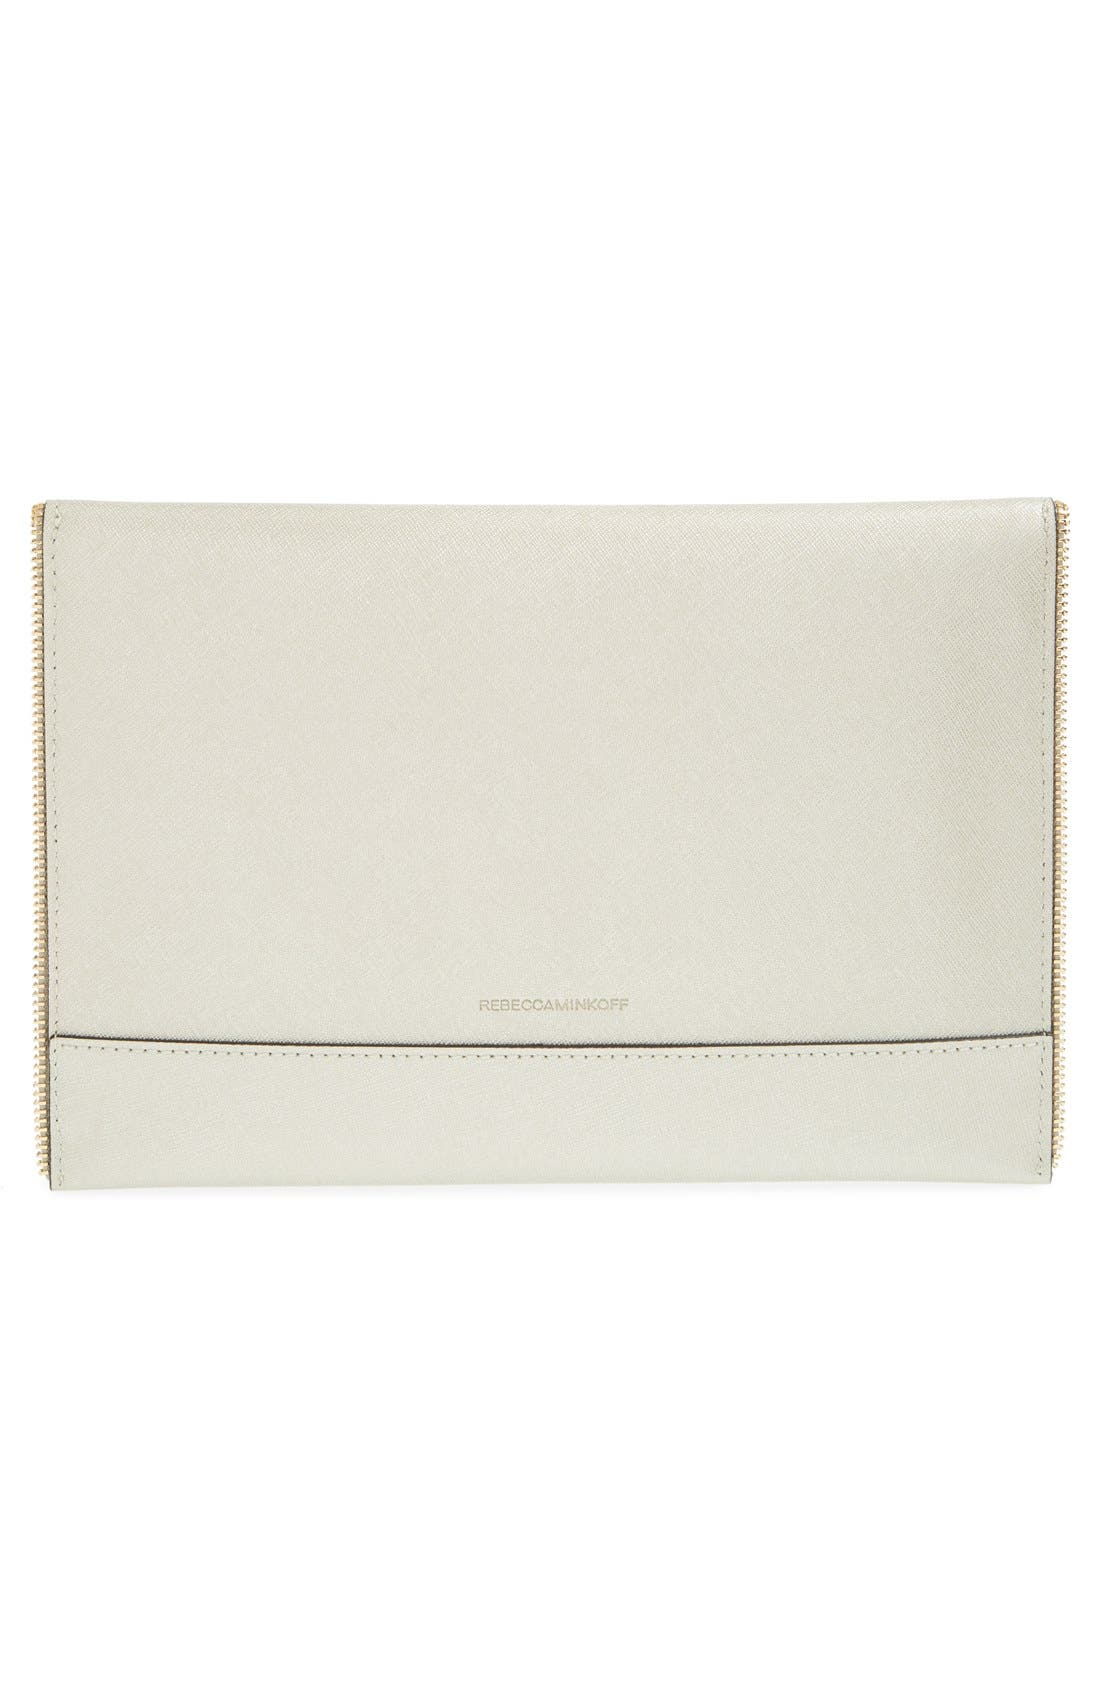 Alternate Image 3  - Rebecca Minkoff 'Leo' Saffiano Leather Envelope Clutch